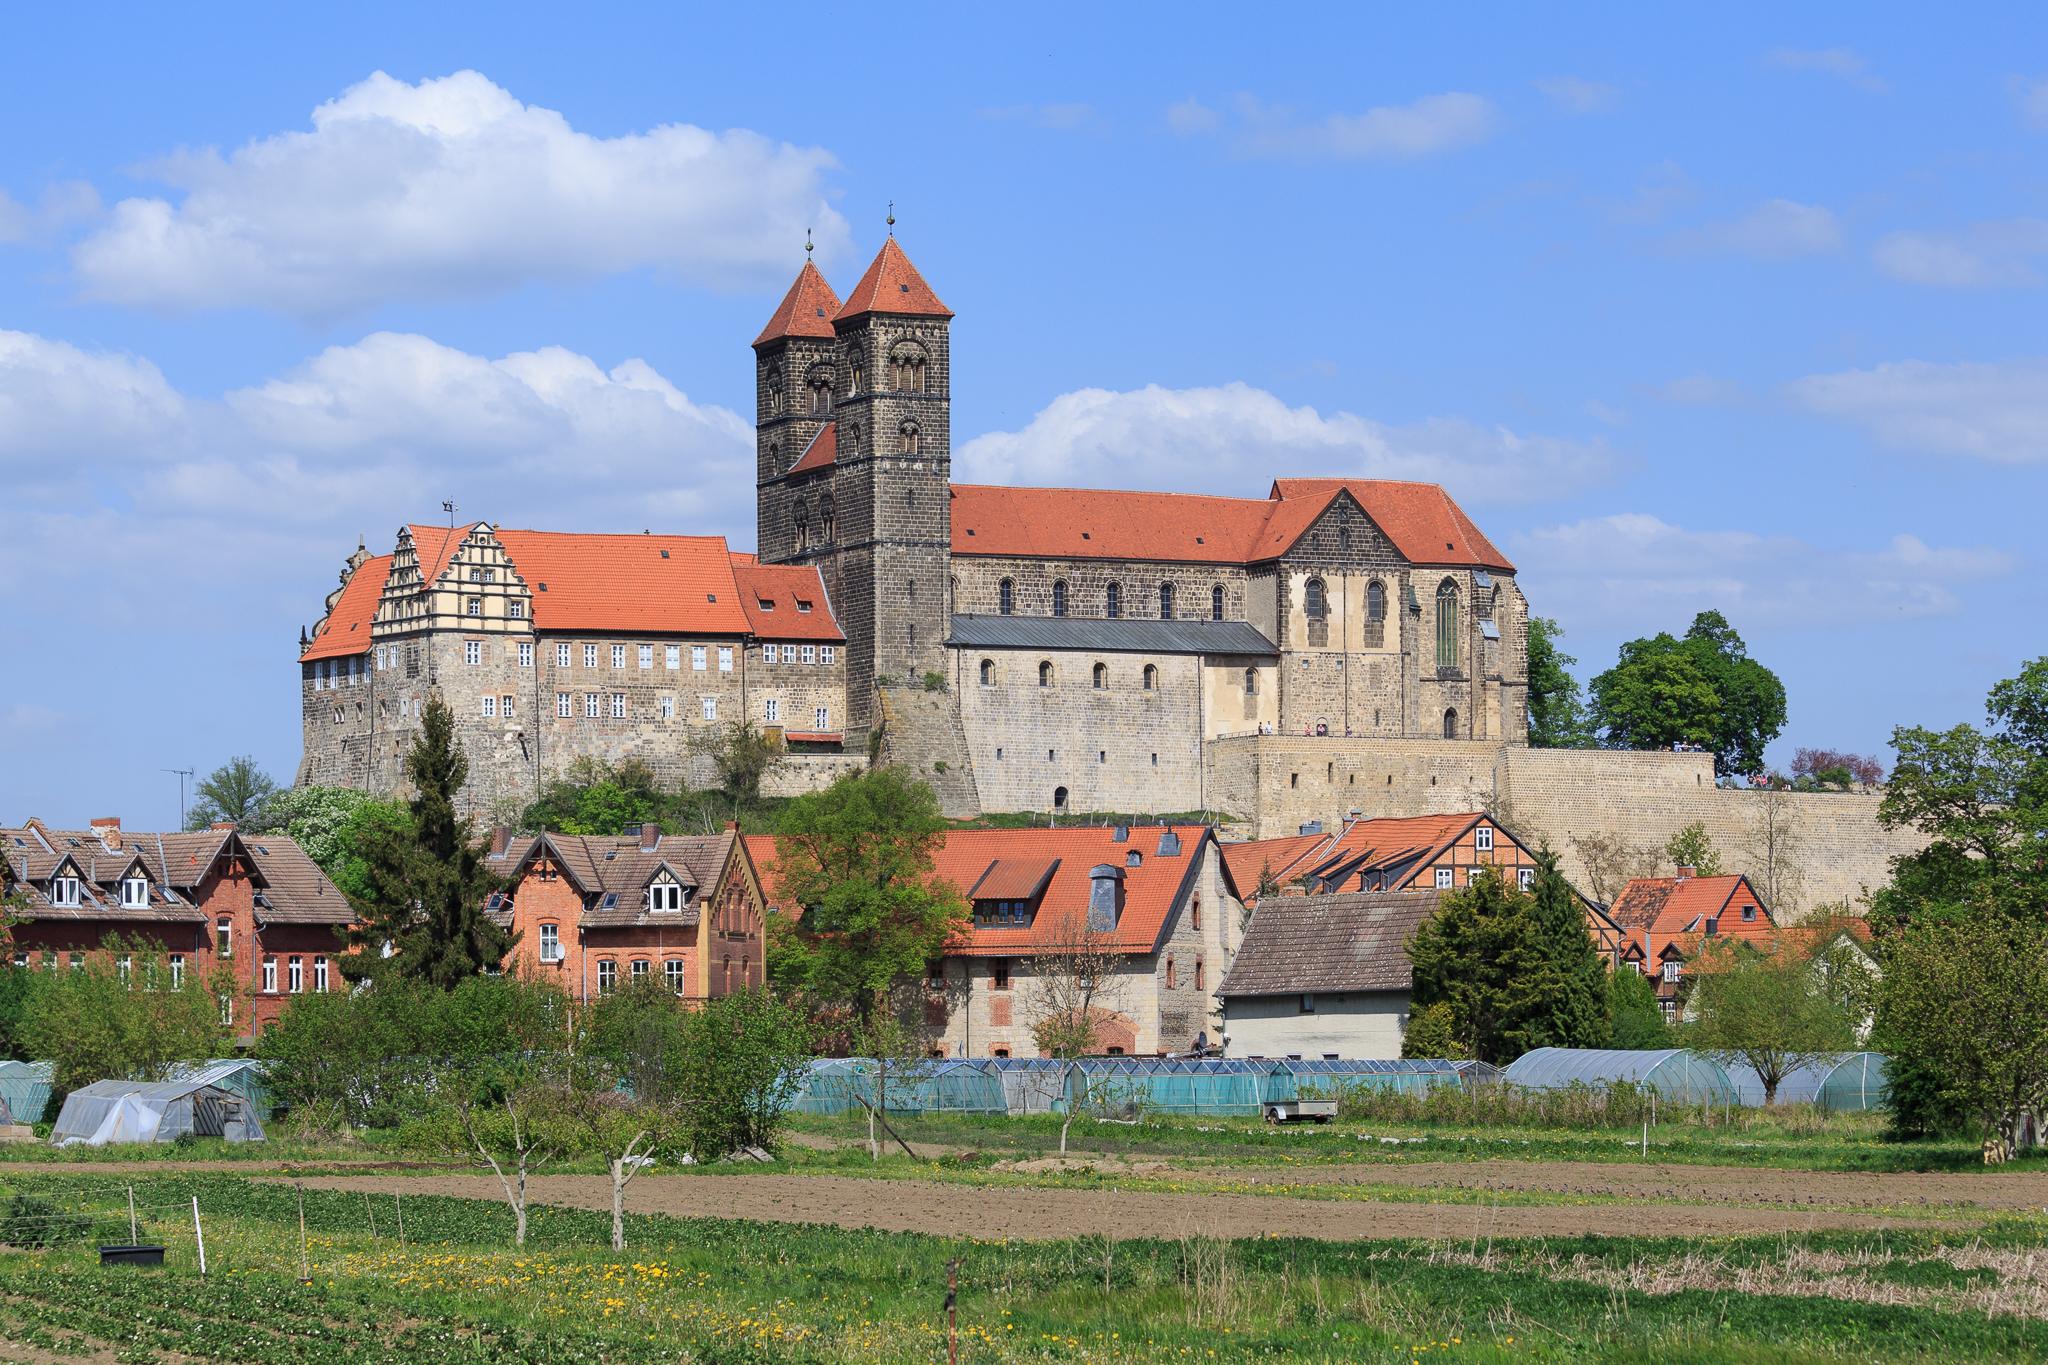 Adelaide II, Abbess of Quedlinburg